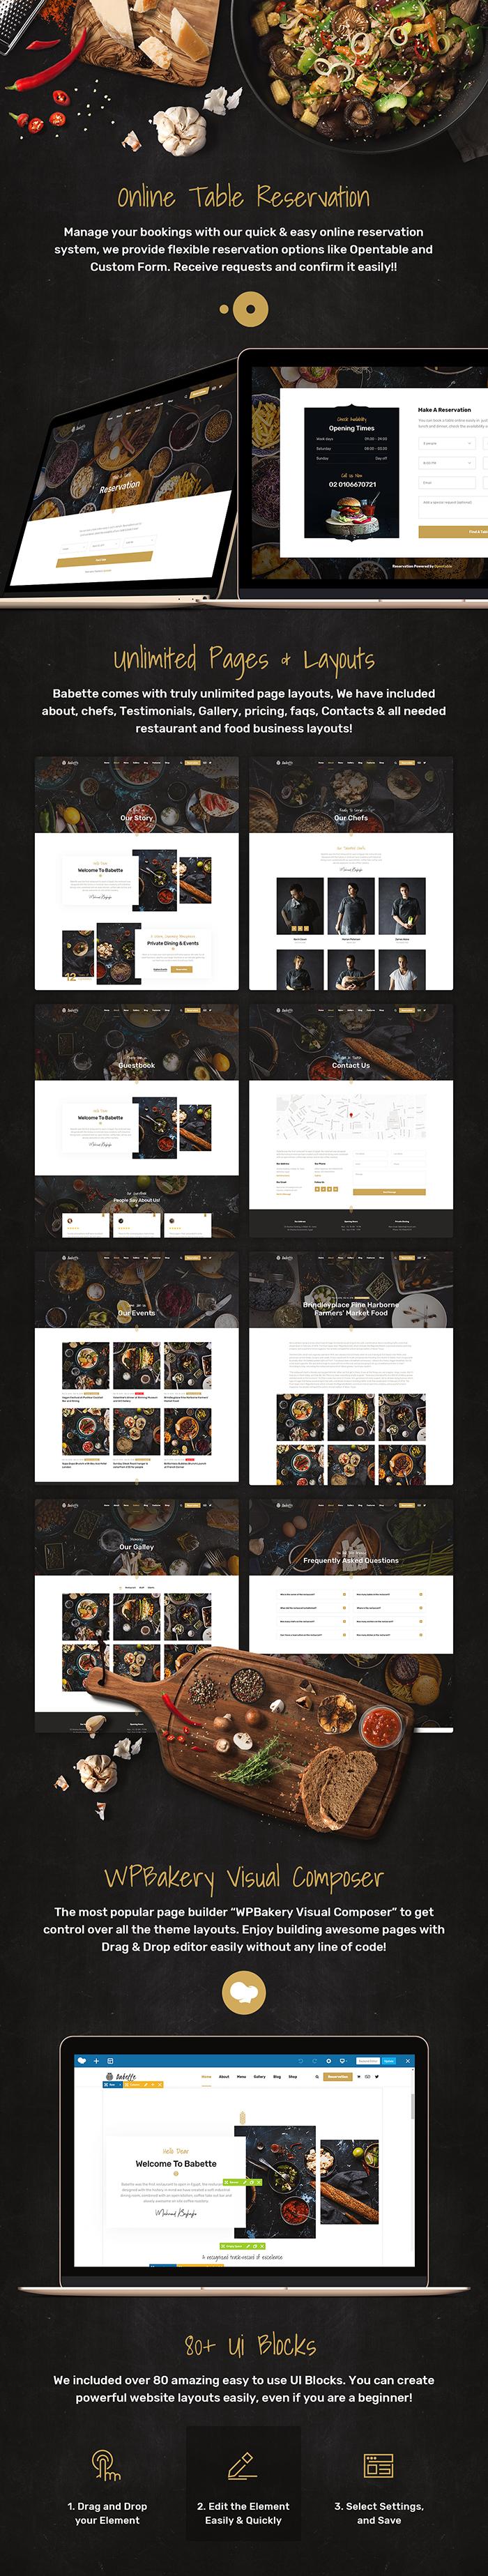 Babette - Restaurant & Cafe WordPress Theme - 8